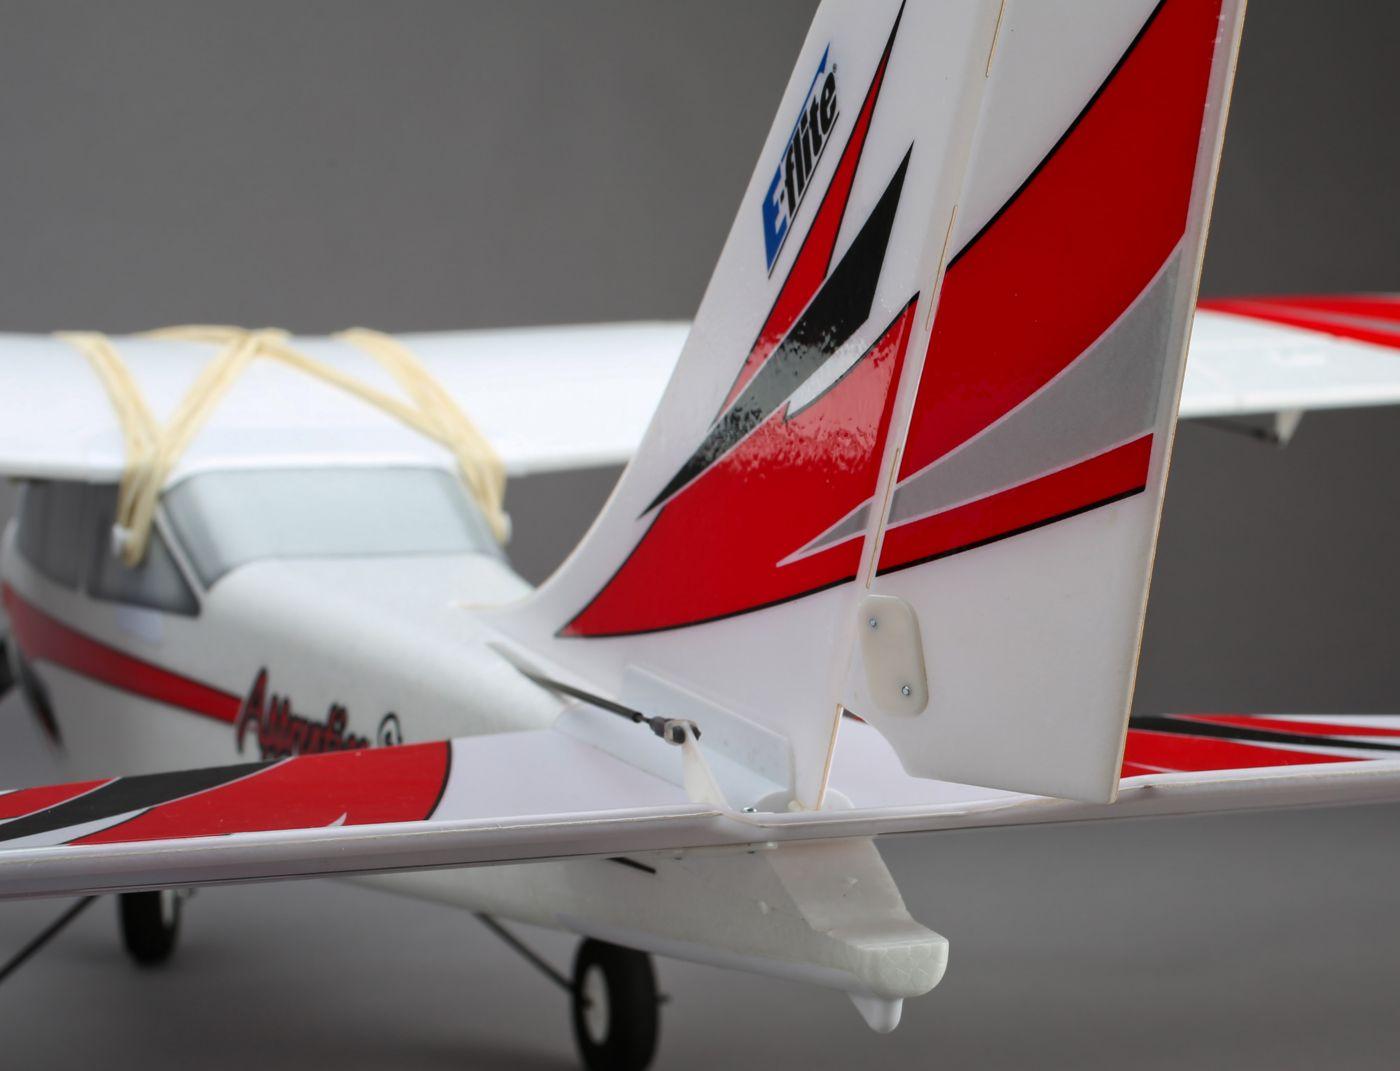 Best RC Airplane for Beginners - E-Flite Apprentice S 15e